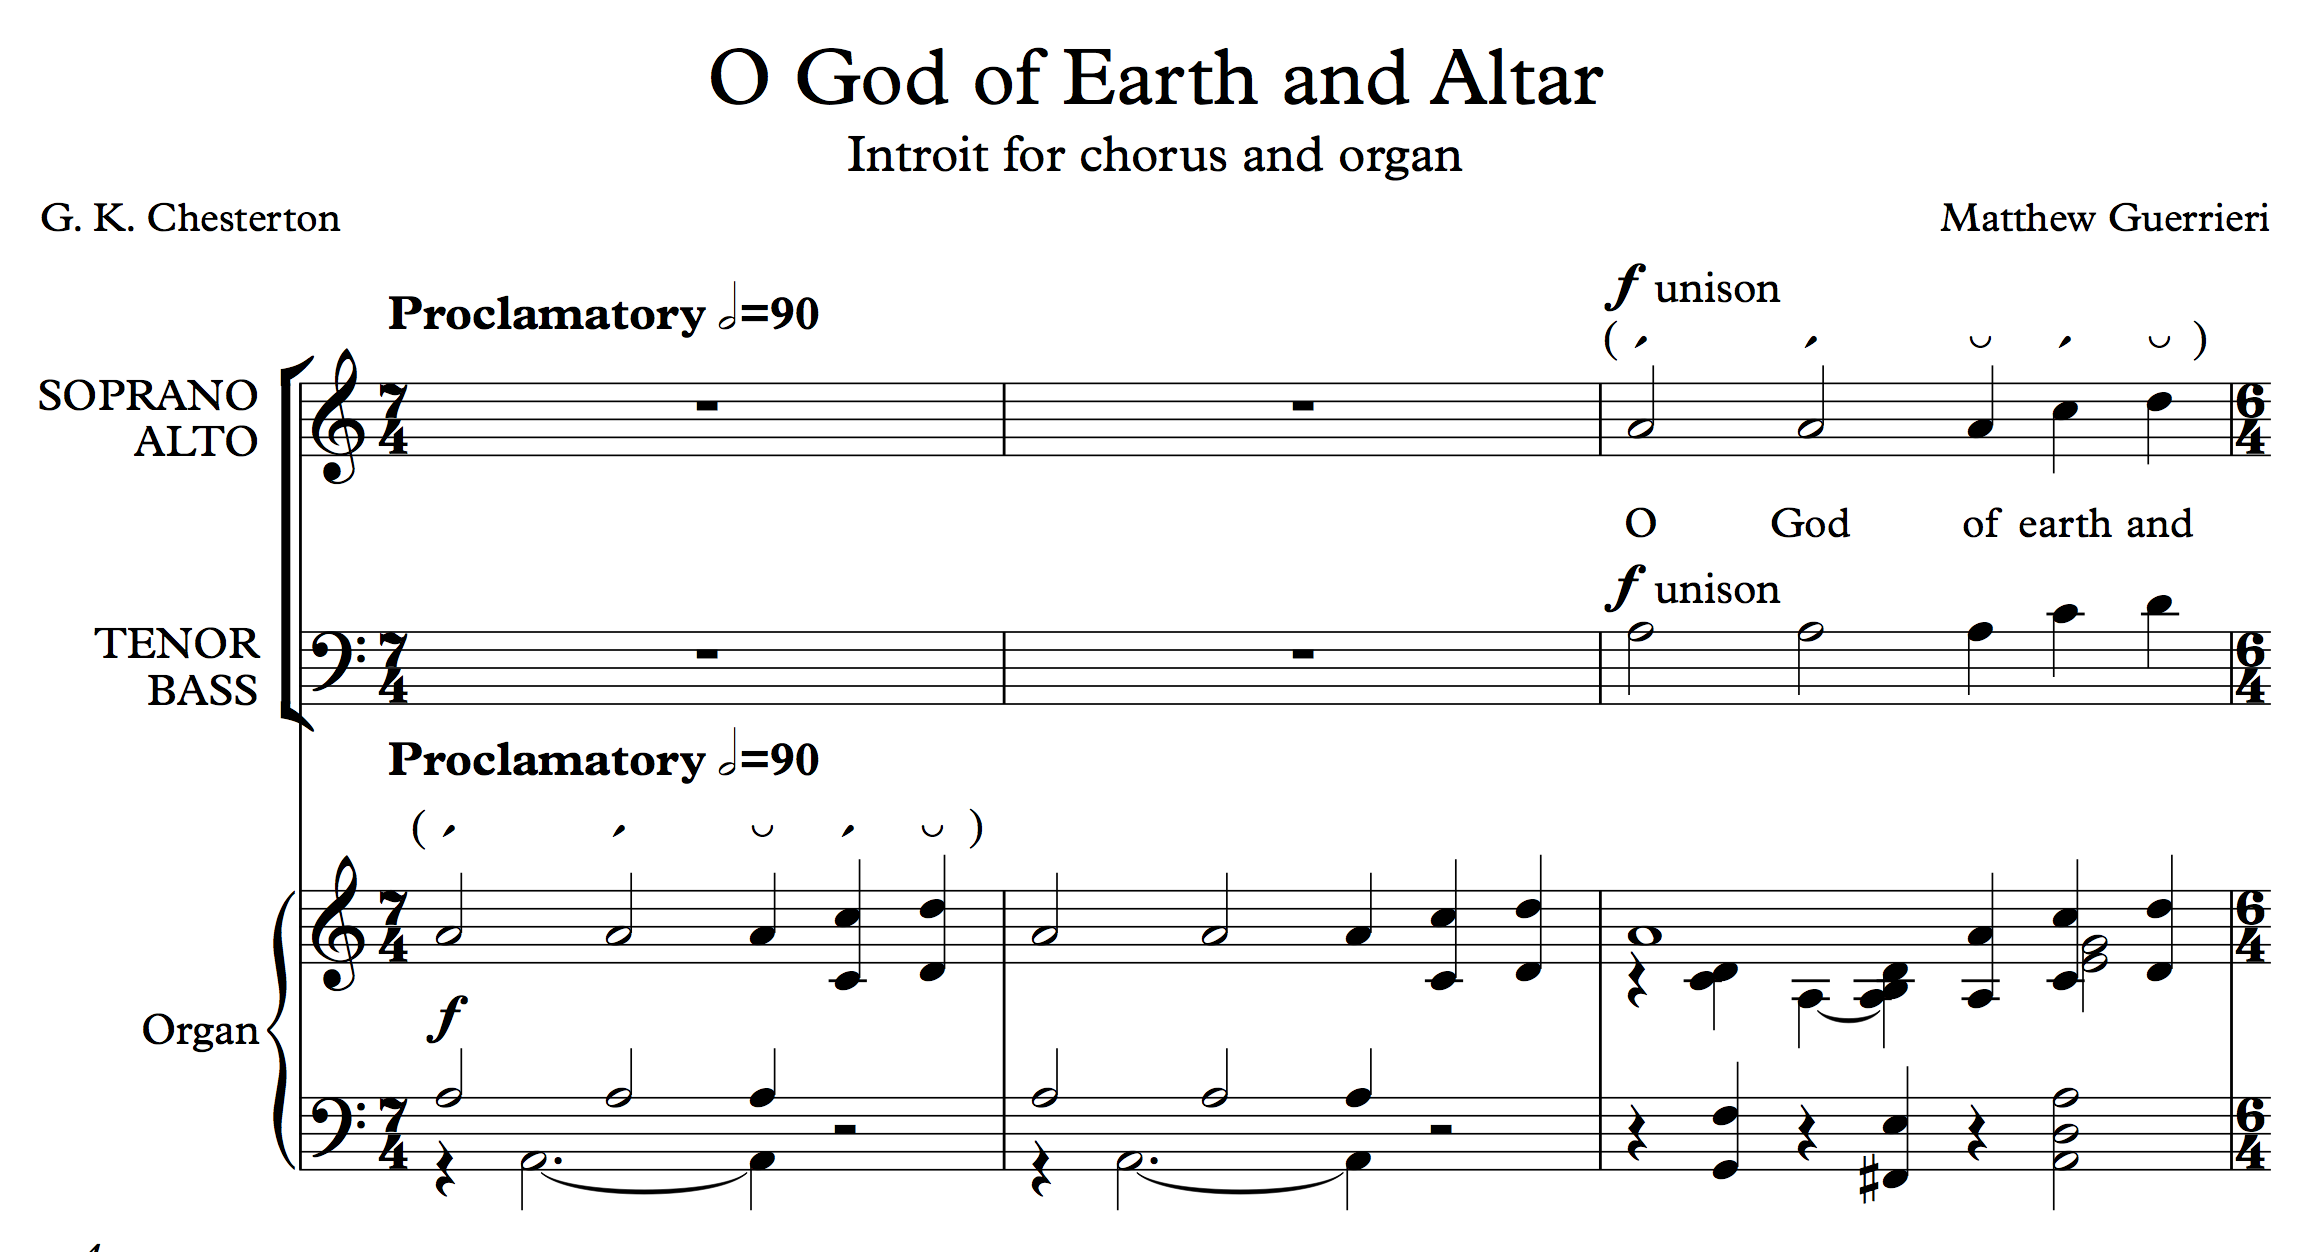 O God of Earth and Altar 1-3_0001